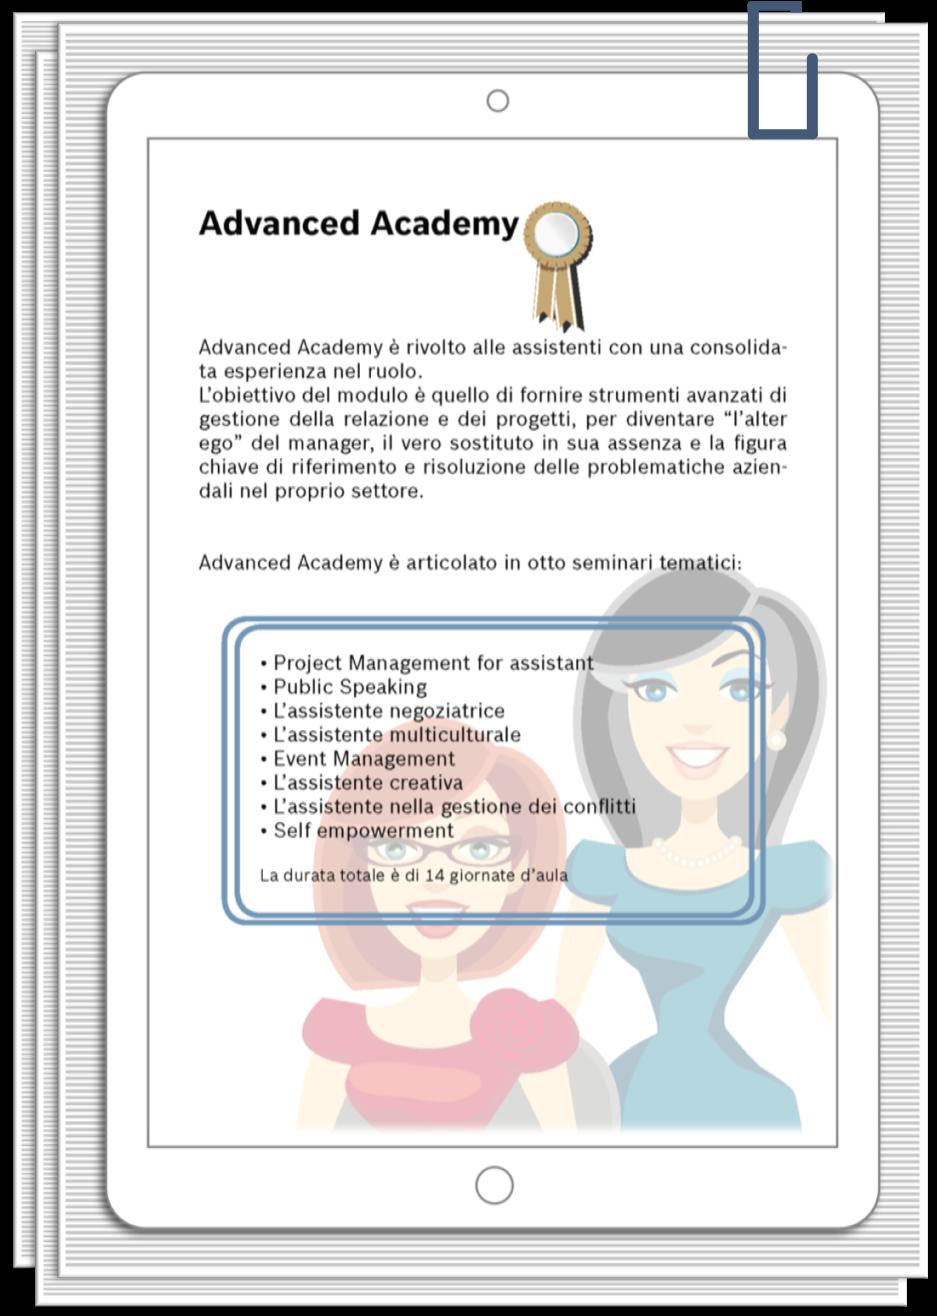 IreneLinguari_AssistenteDallaAallaZeta_About_Irene_02_Formazione_Assistente_A_SecretaryAcademy_Adv_prog